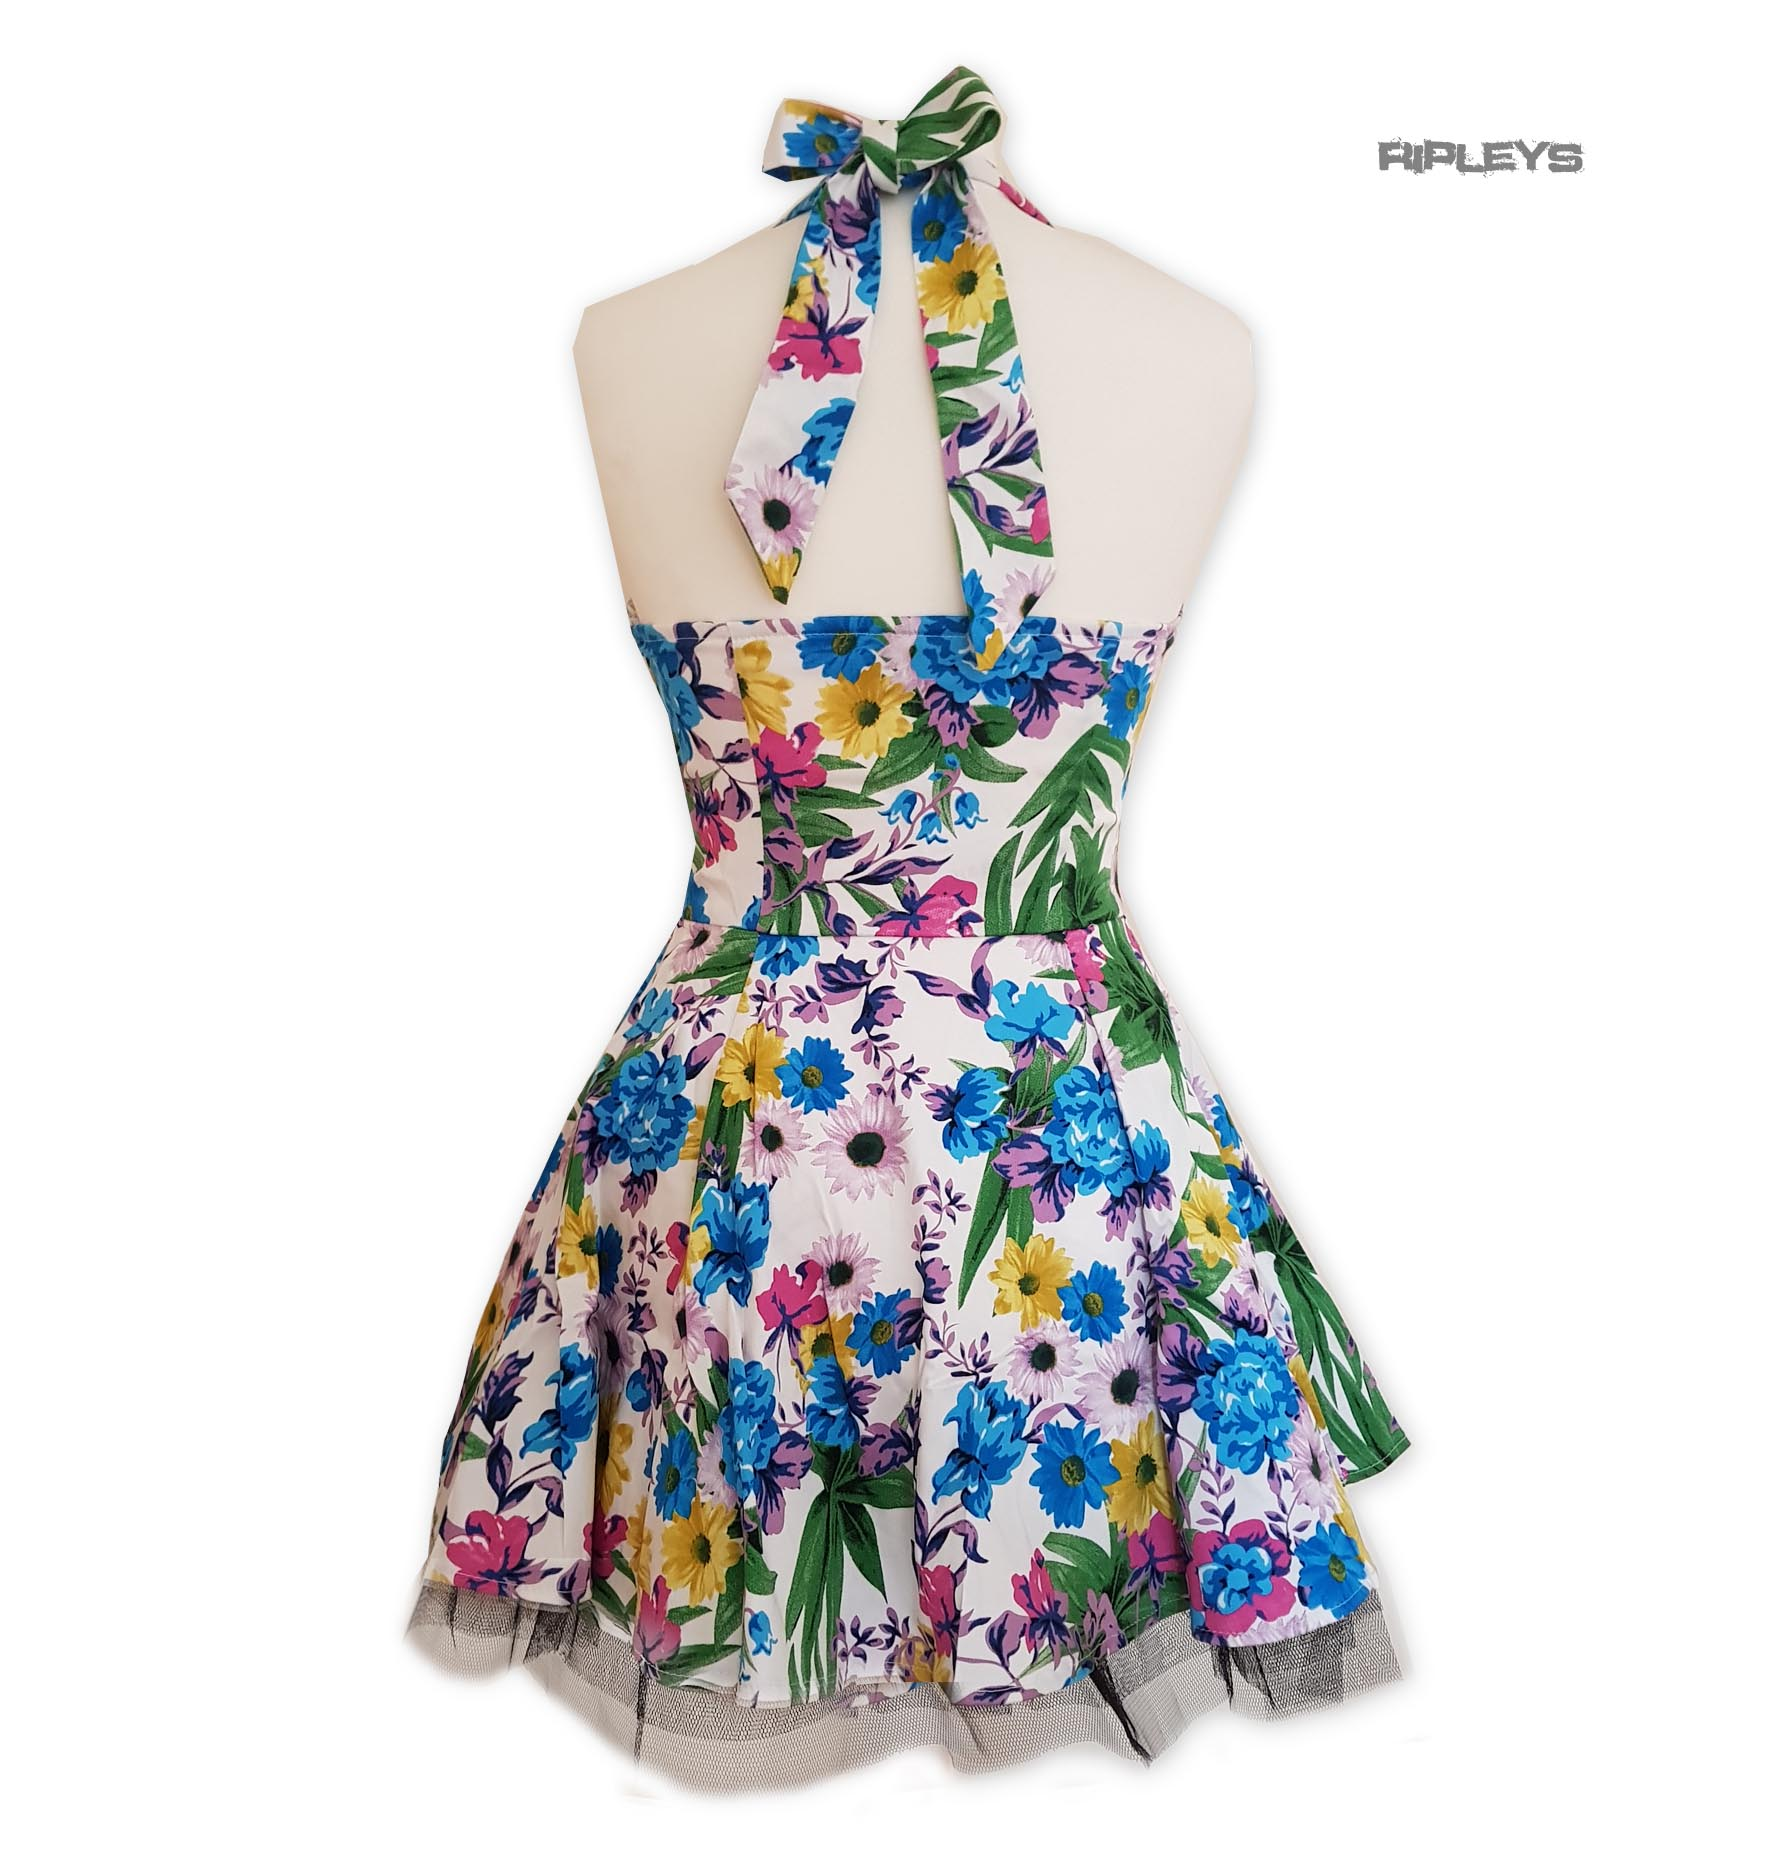 H-amp-R-Hearts-amp-Roses-London-White-Mini-Dress-039-Summer-Day-039-Flowers-All-Sizes thumbnail 16